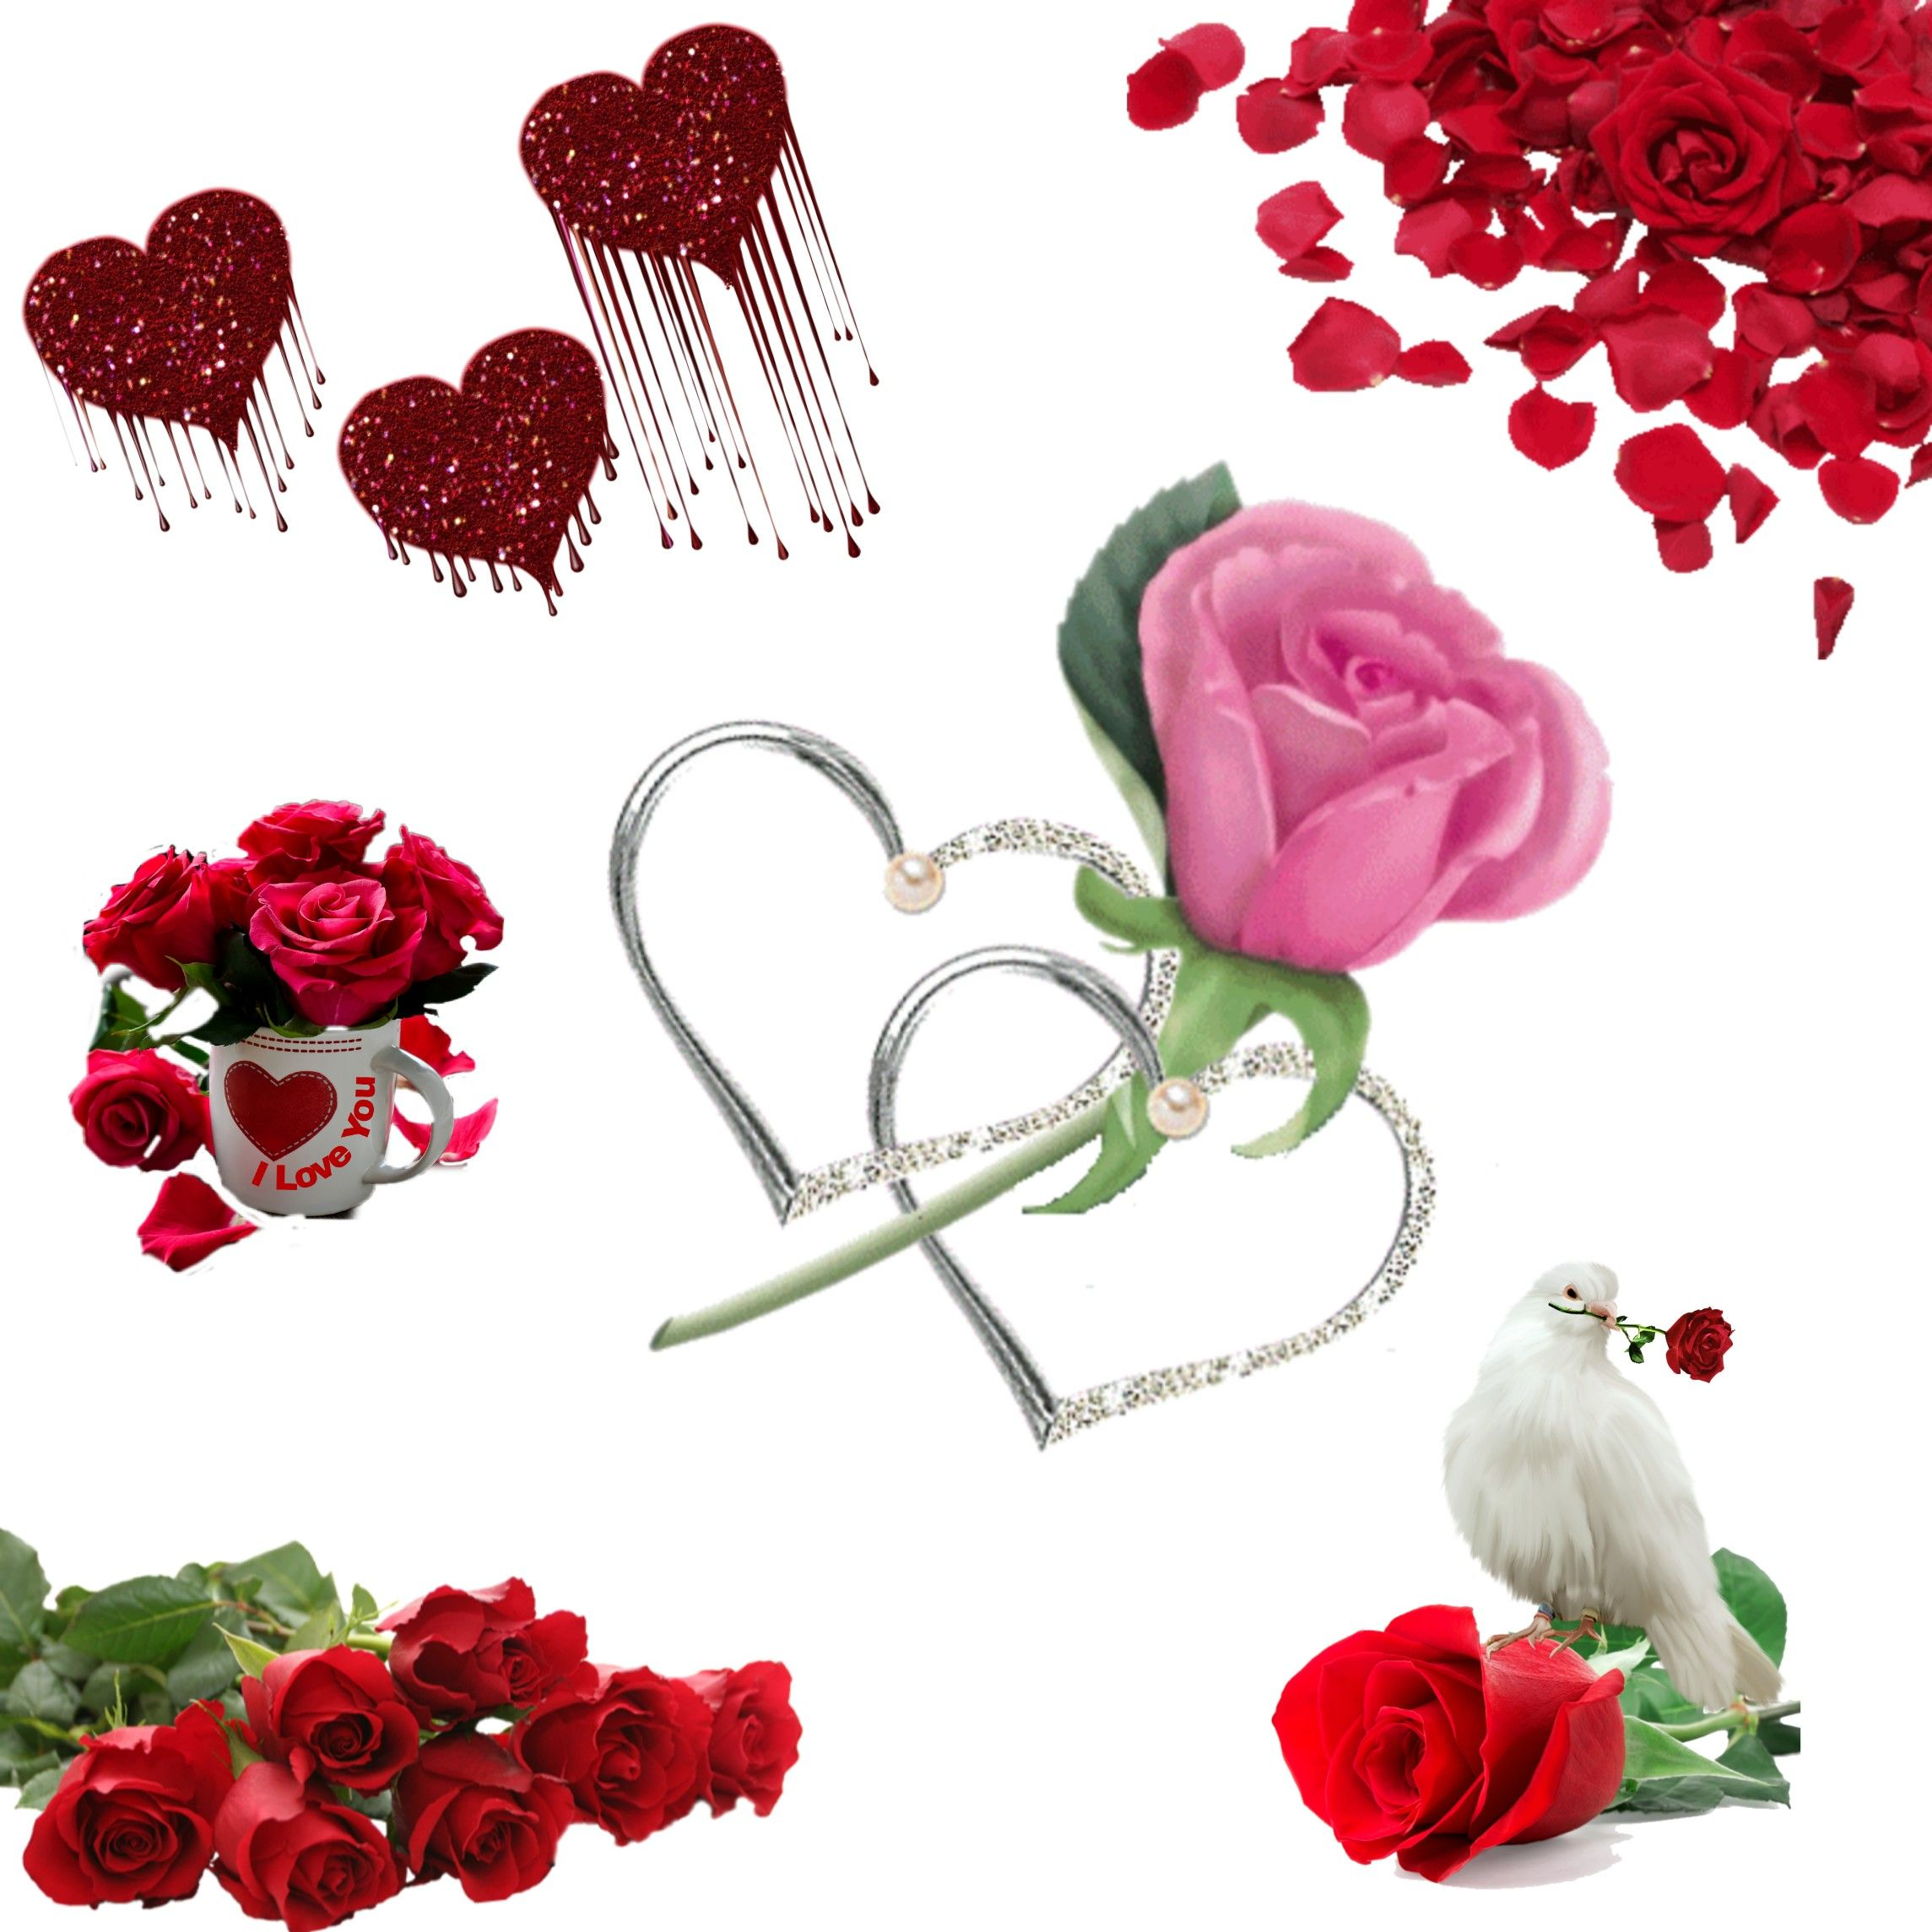 Pin By Adroja Kalpesh On Rose Flowers Rose Flower Creative Flowers